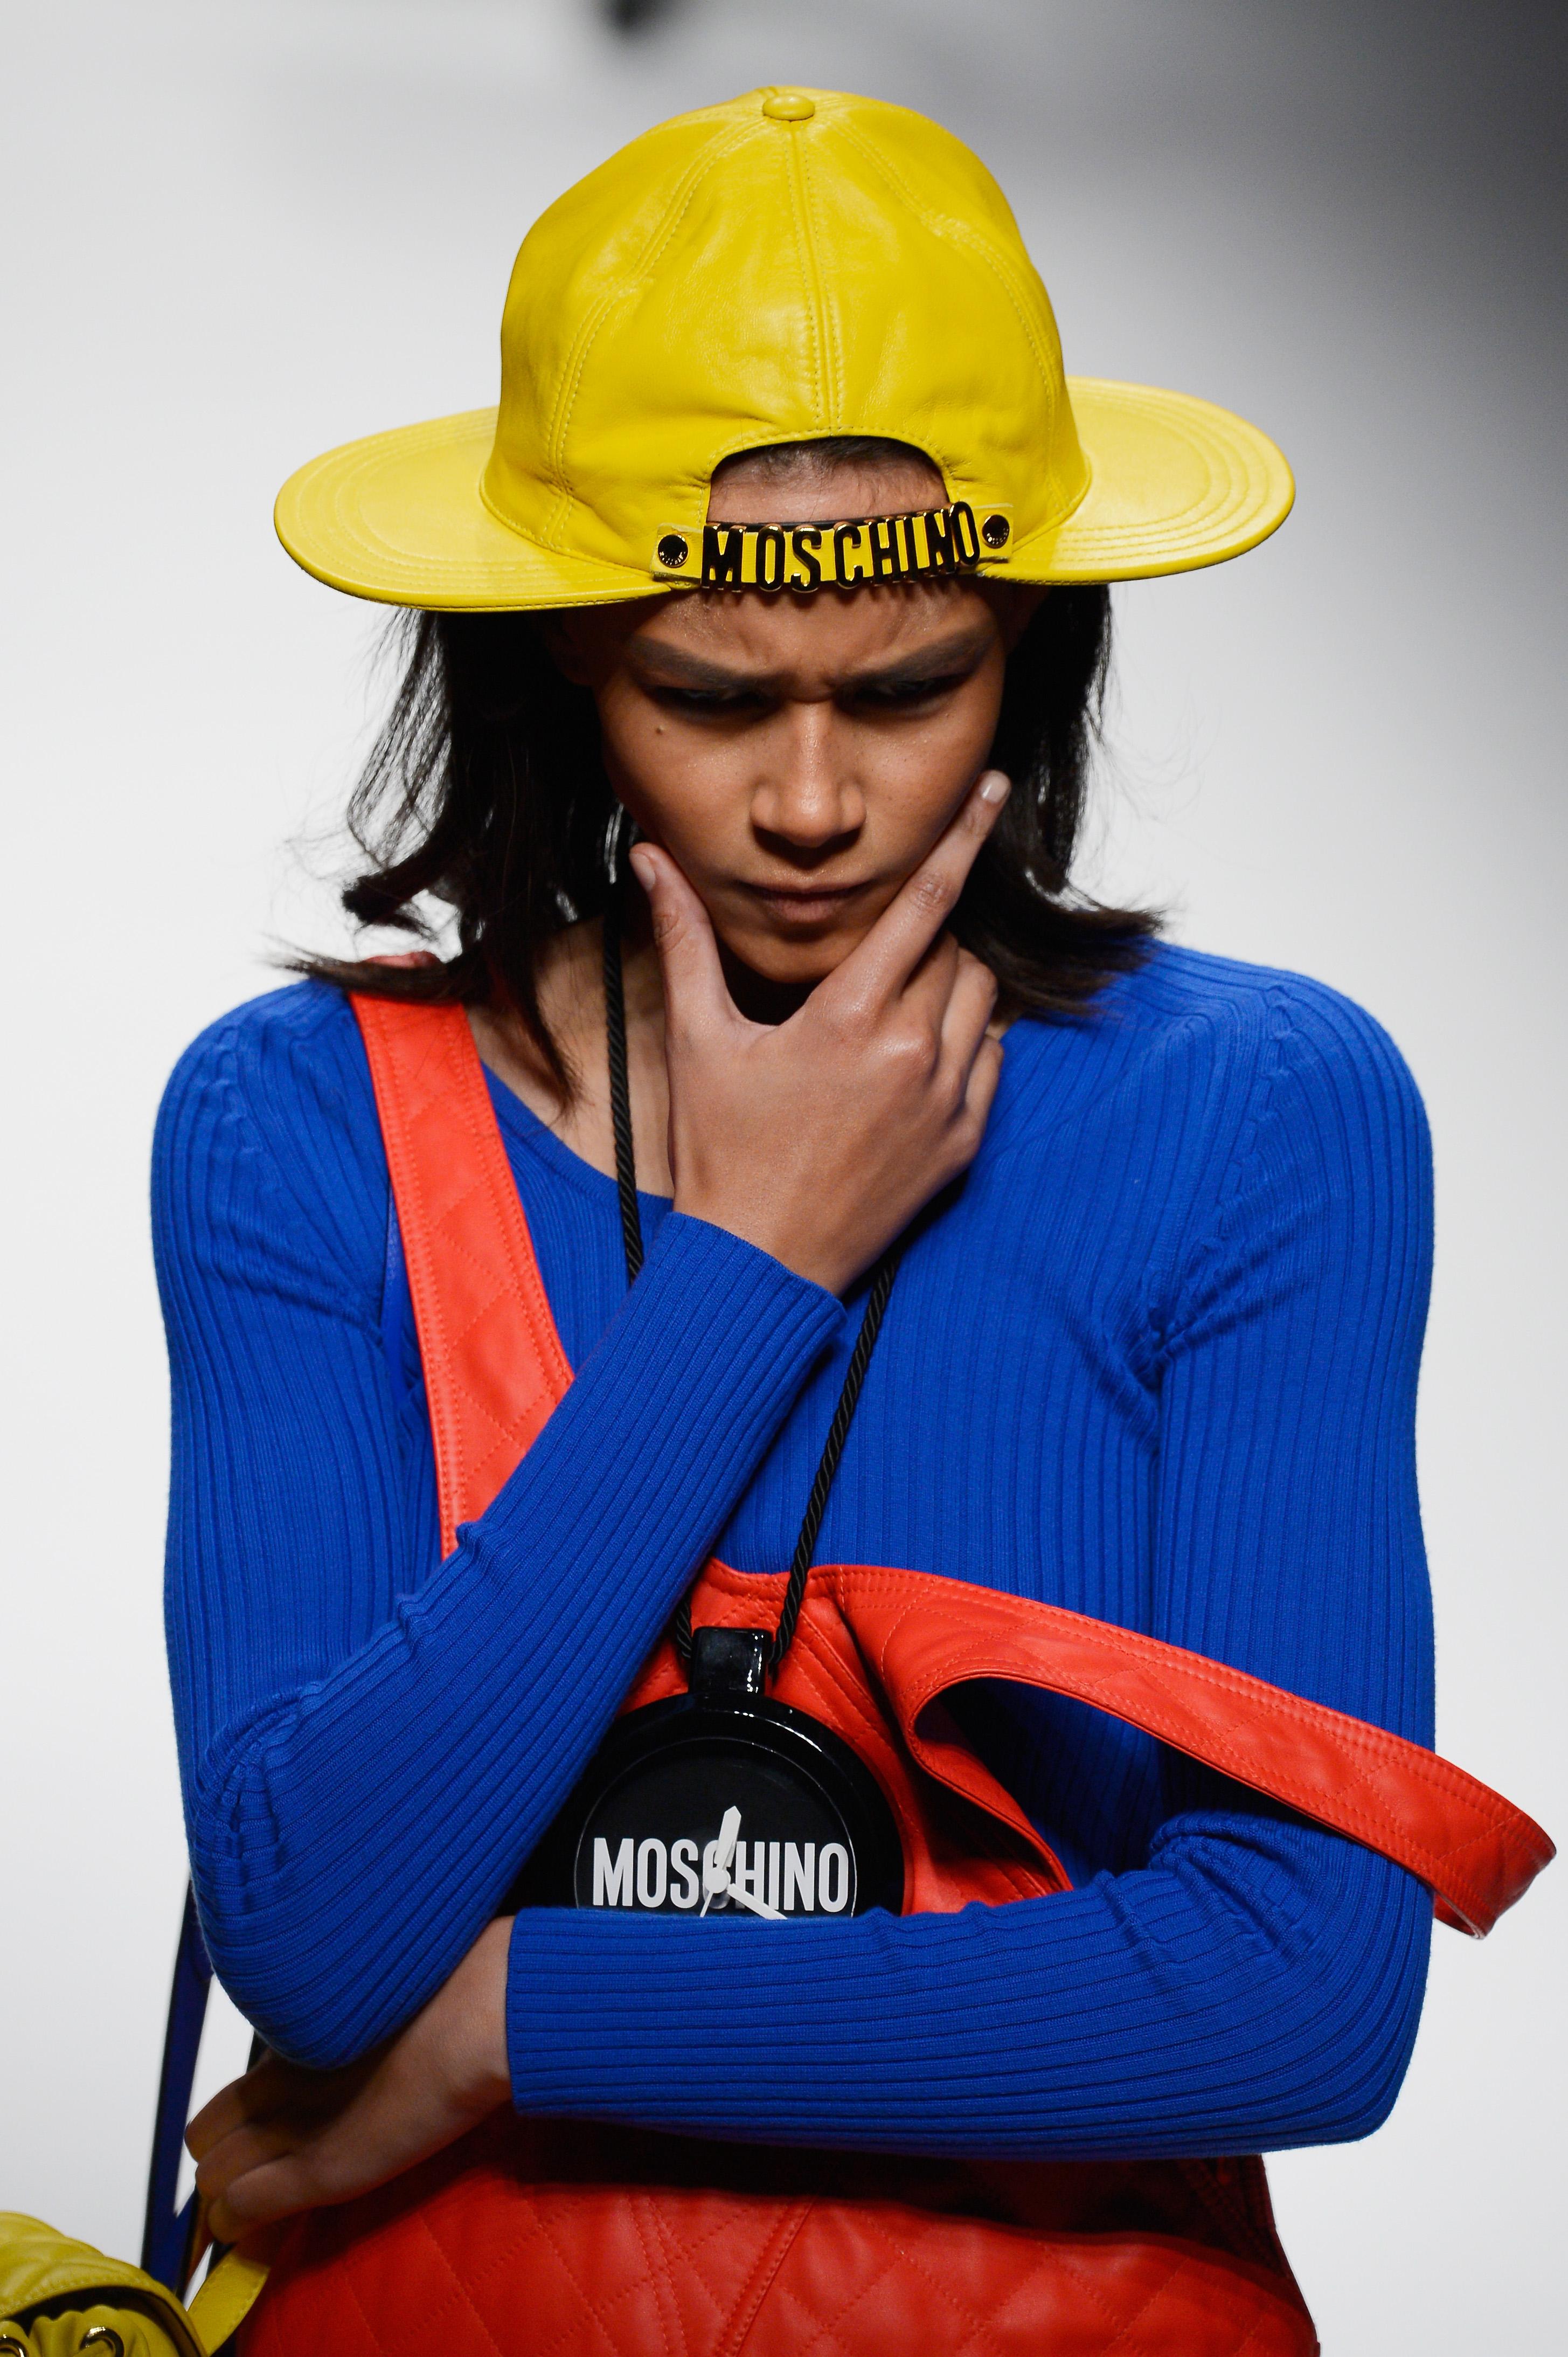 moschino, milan fashion week, fall 2015, model, runway, fashion, style, clothing